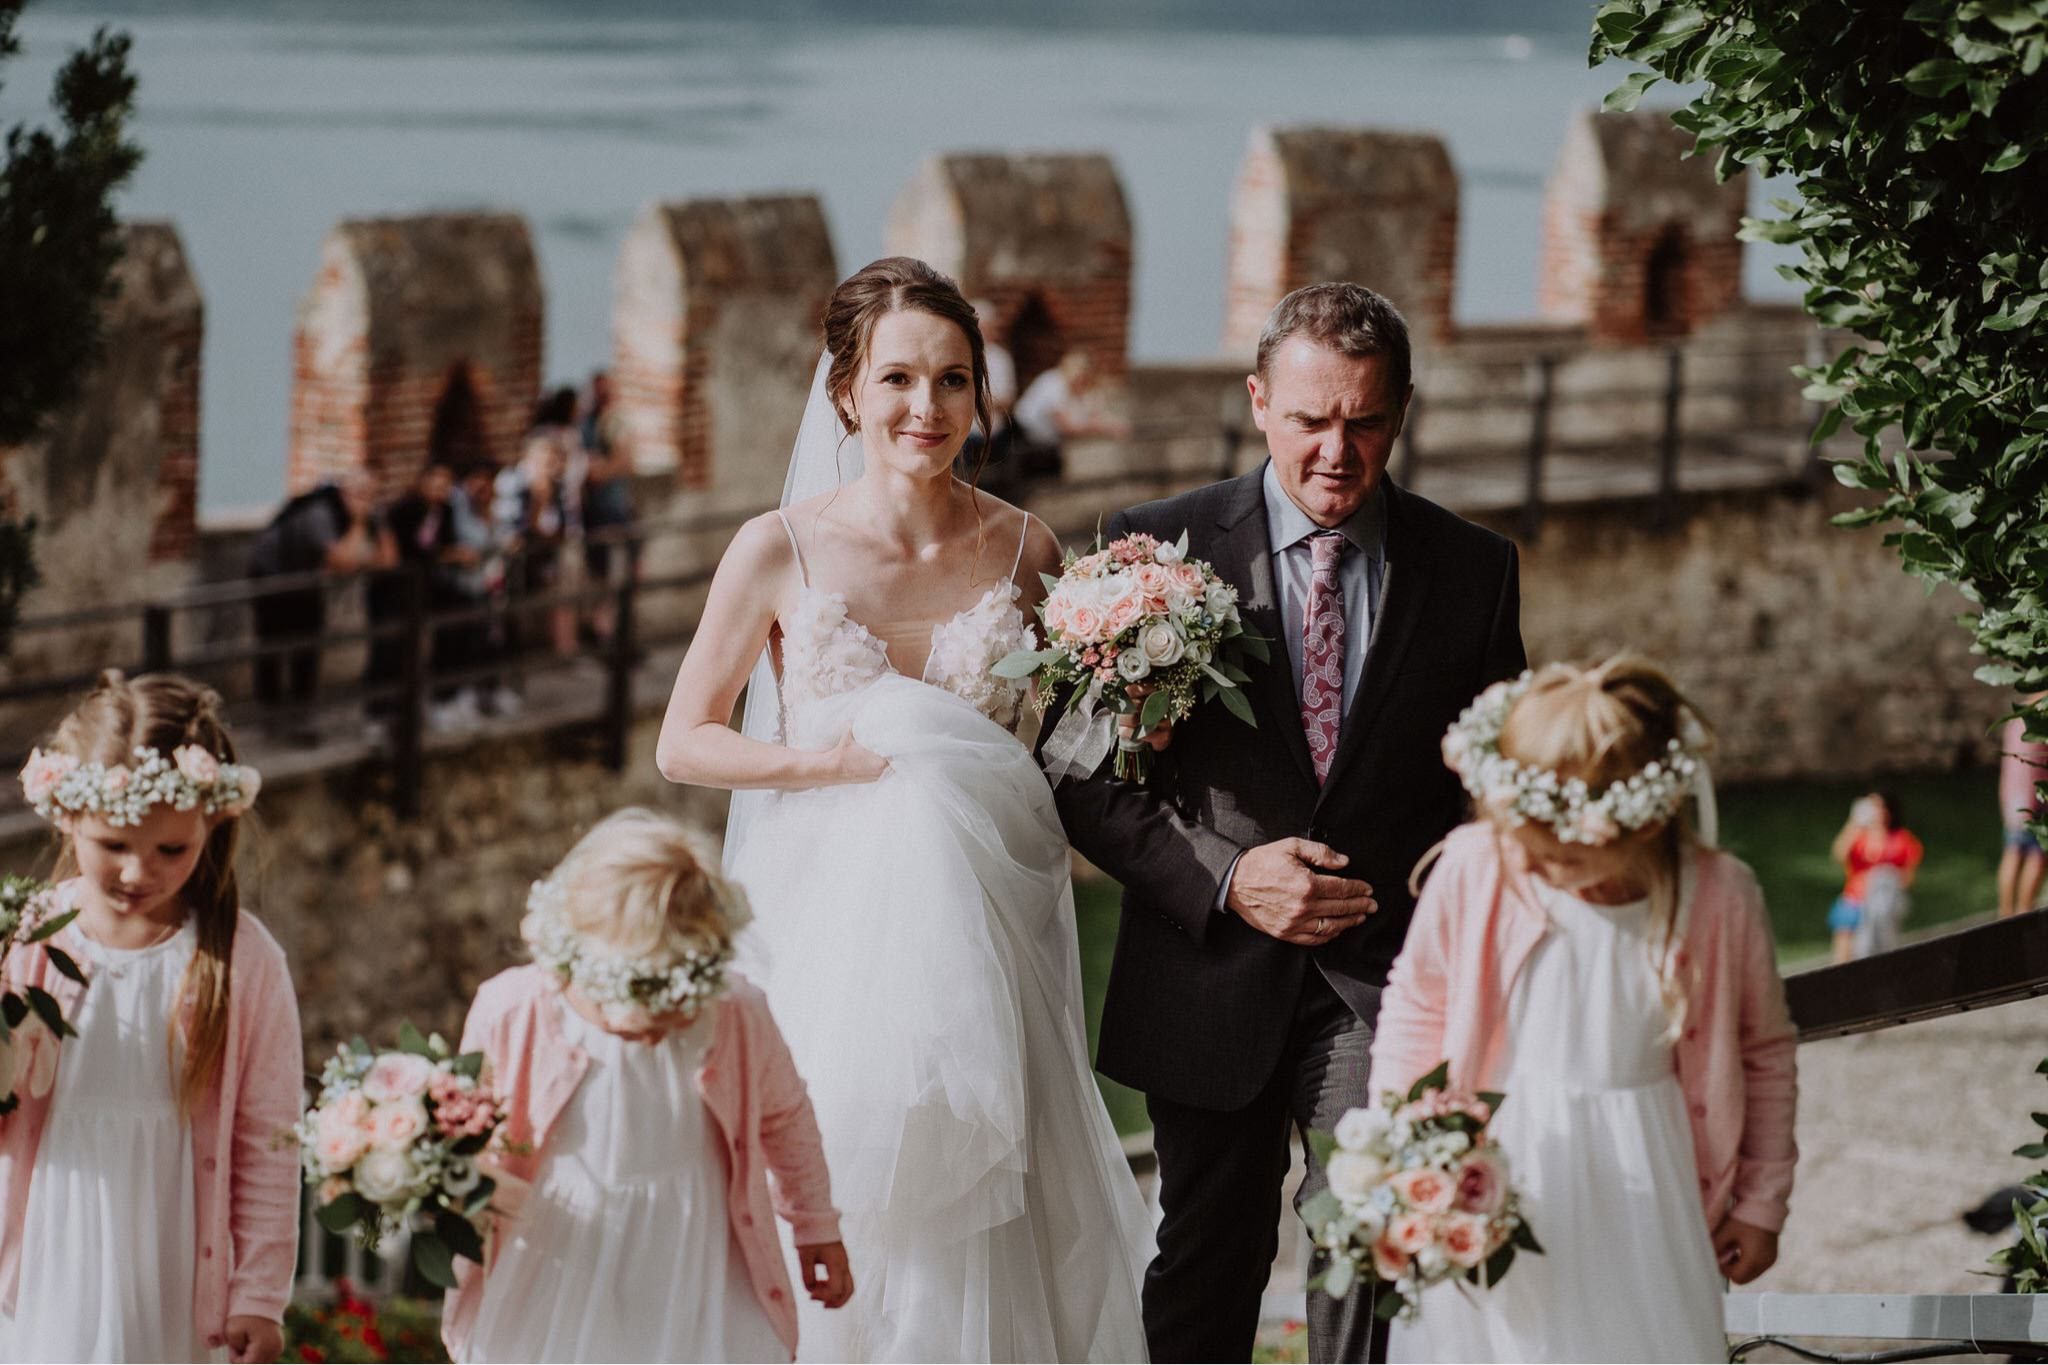 34 la 03 zeremonie 1018 weddinphotographer Hochzeitsfotograf newzealand hamilton Weddingphotography Stuttgart